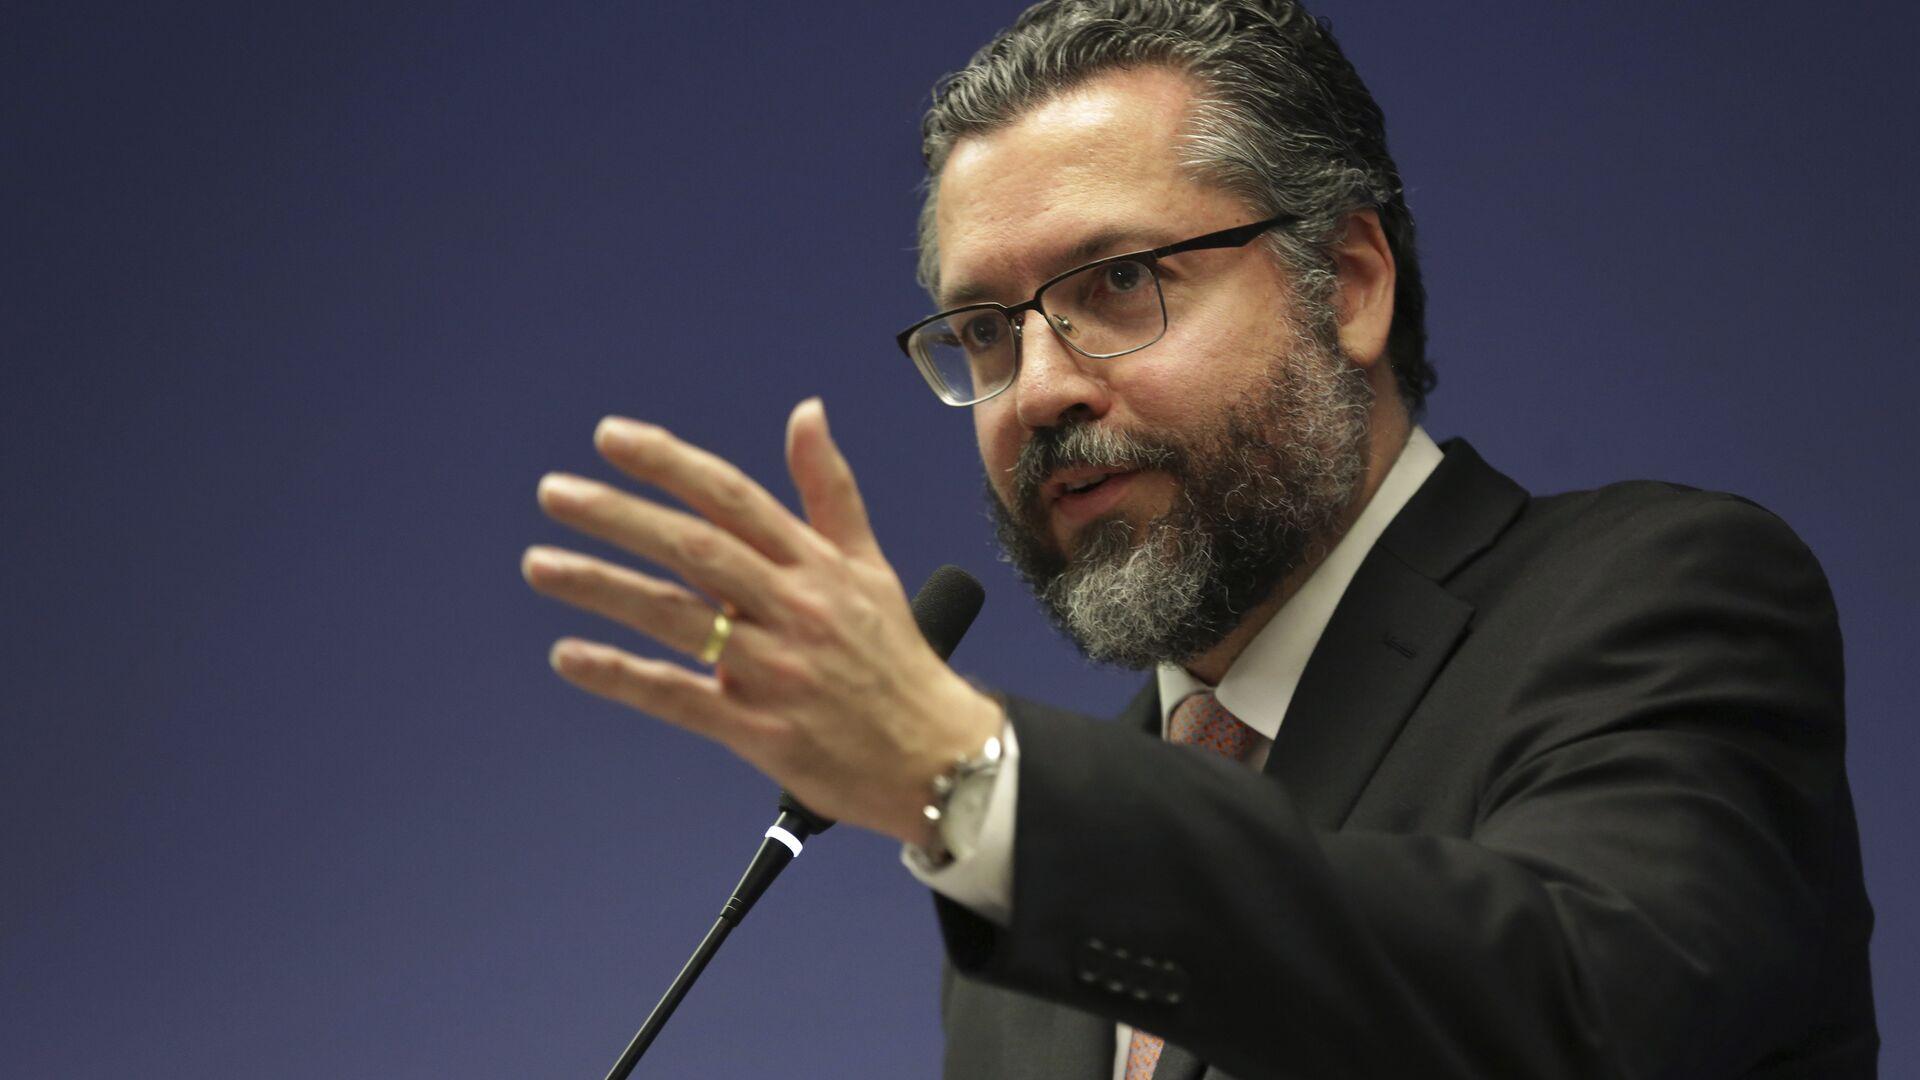 Ernesto Araújo, ministro de Relaciones Exteriores de Brasil - Sputnik Mundo, 1920, 18.05.2021